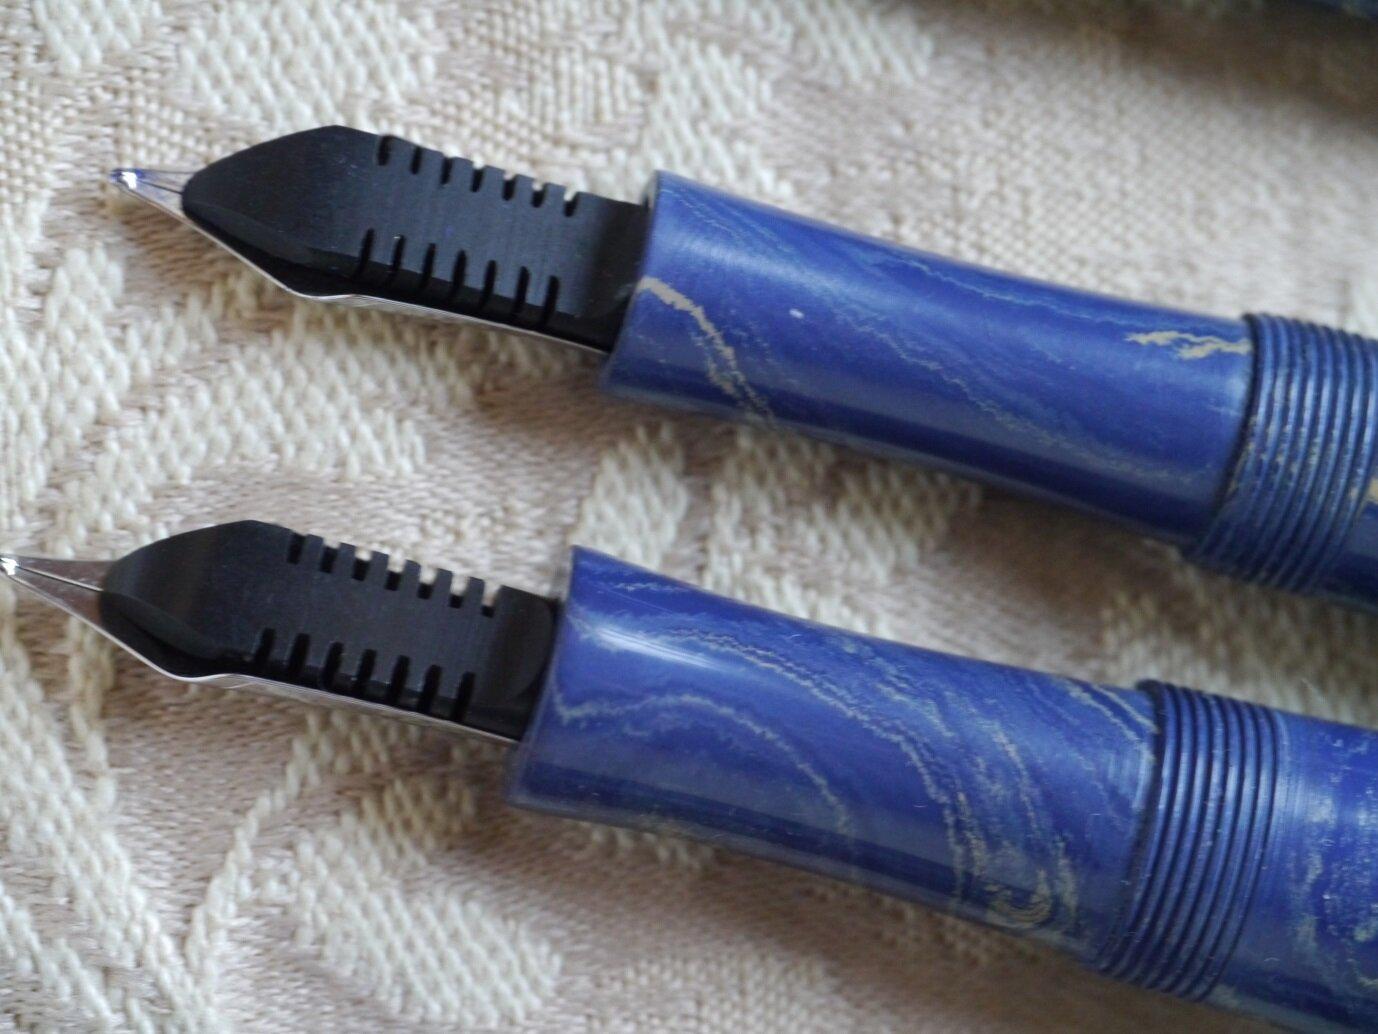 P1170140-3 Ranga 8 and 8B blue-white.jpg